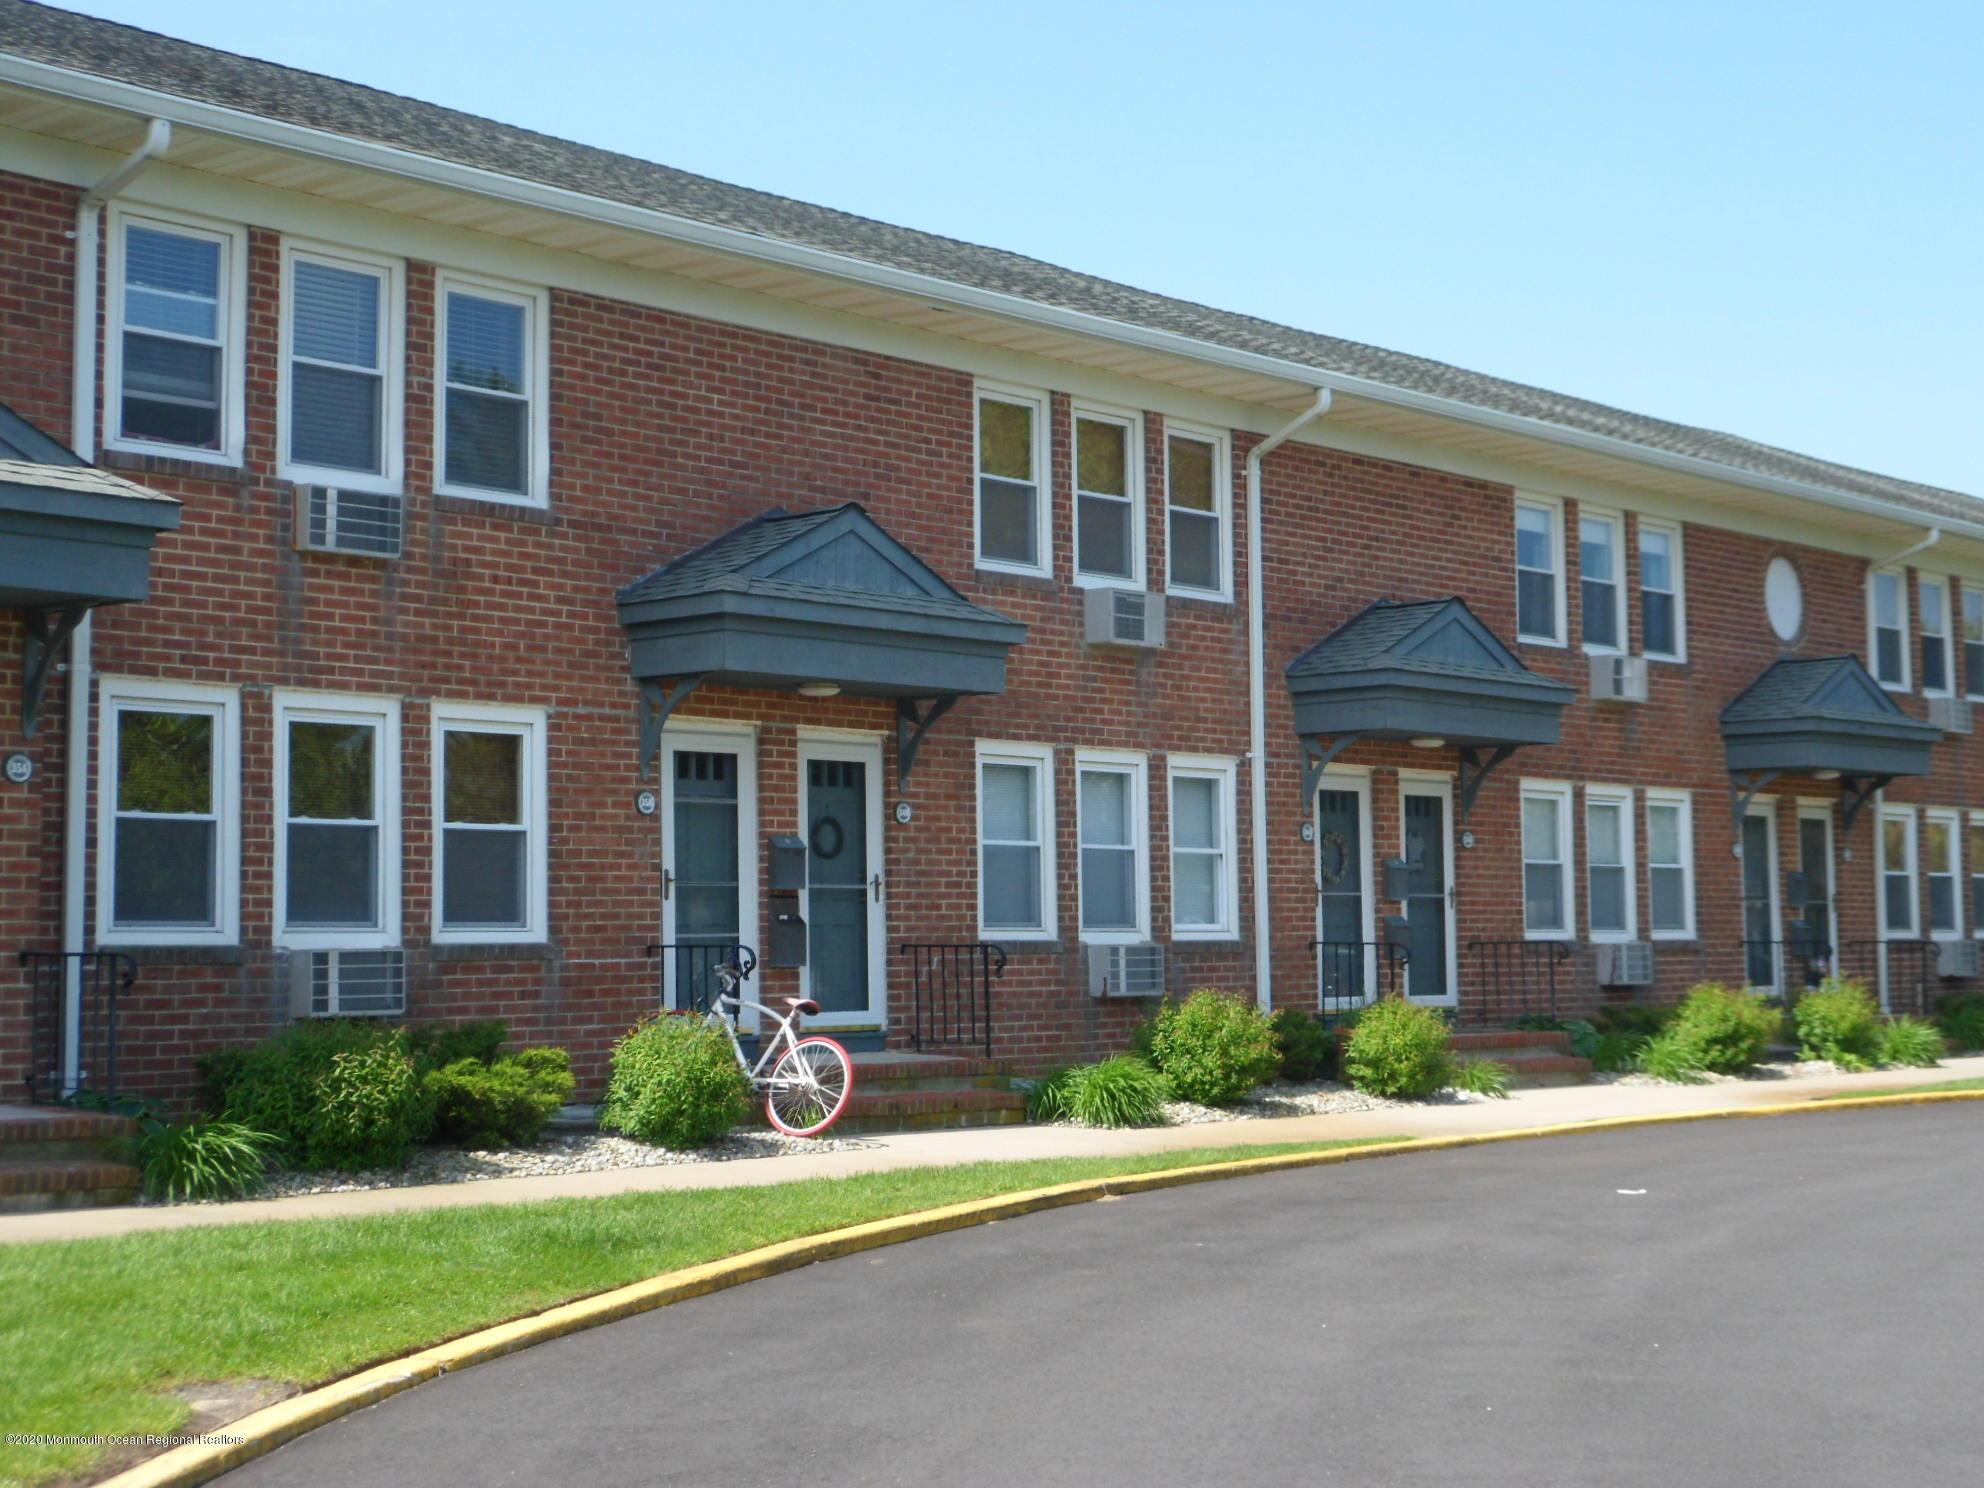 310 Maryland Avenue # 32B, Point Pleasant Beach, NJ 08742